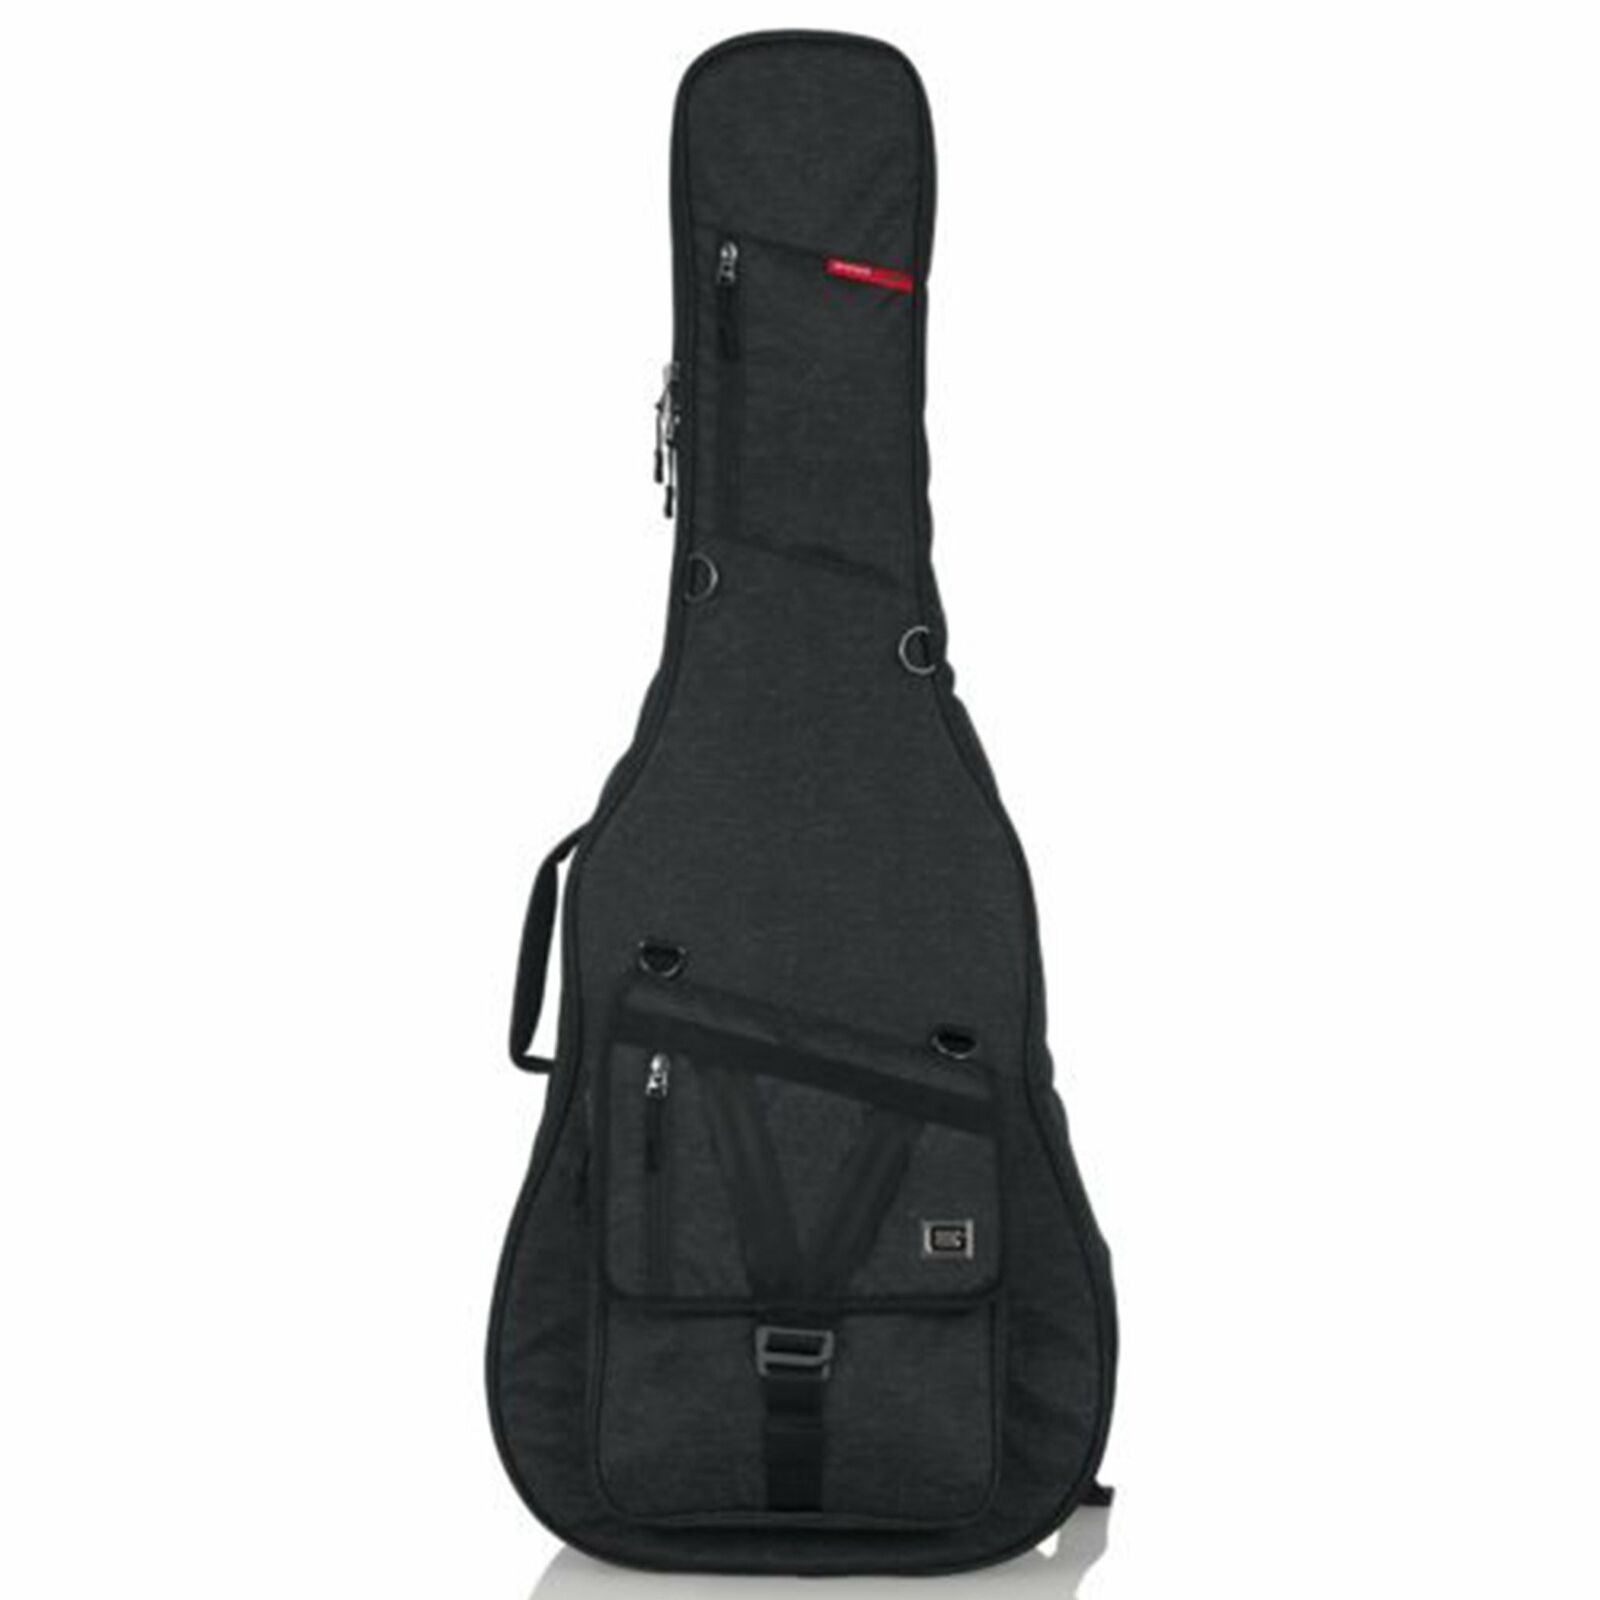 Gator Transit Series Gig Bag - Acoustic Guitar - Charcoal